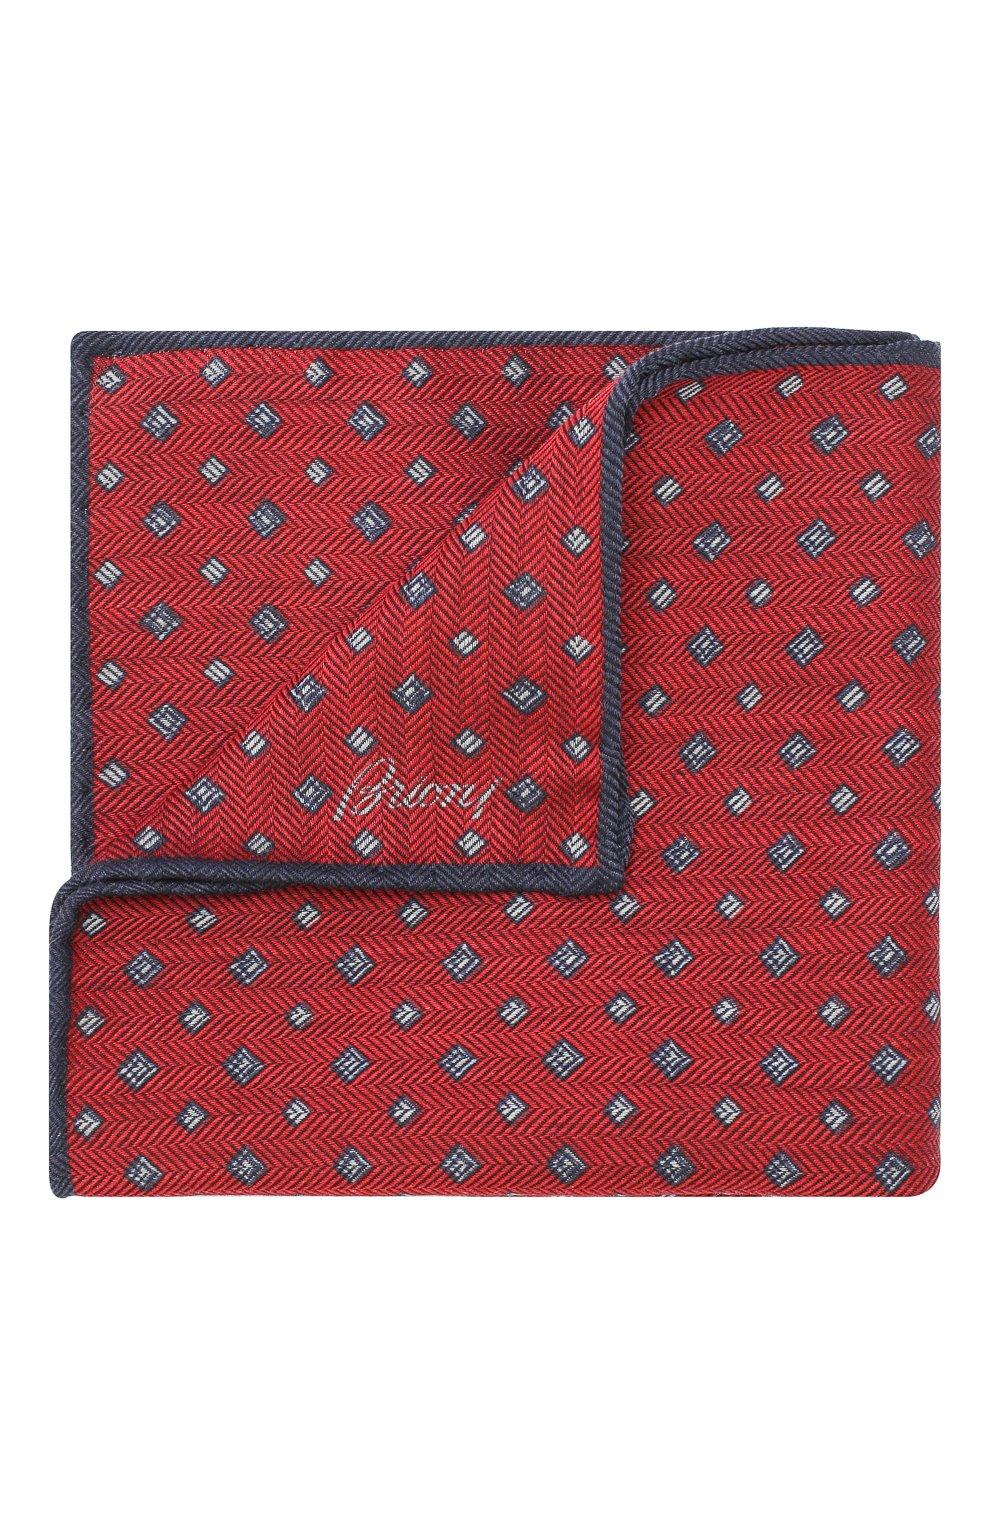 Мужской платок из смеси шерсти и шелка BRIONI красного цвета, арт. 071000/08A9F   Фото 1